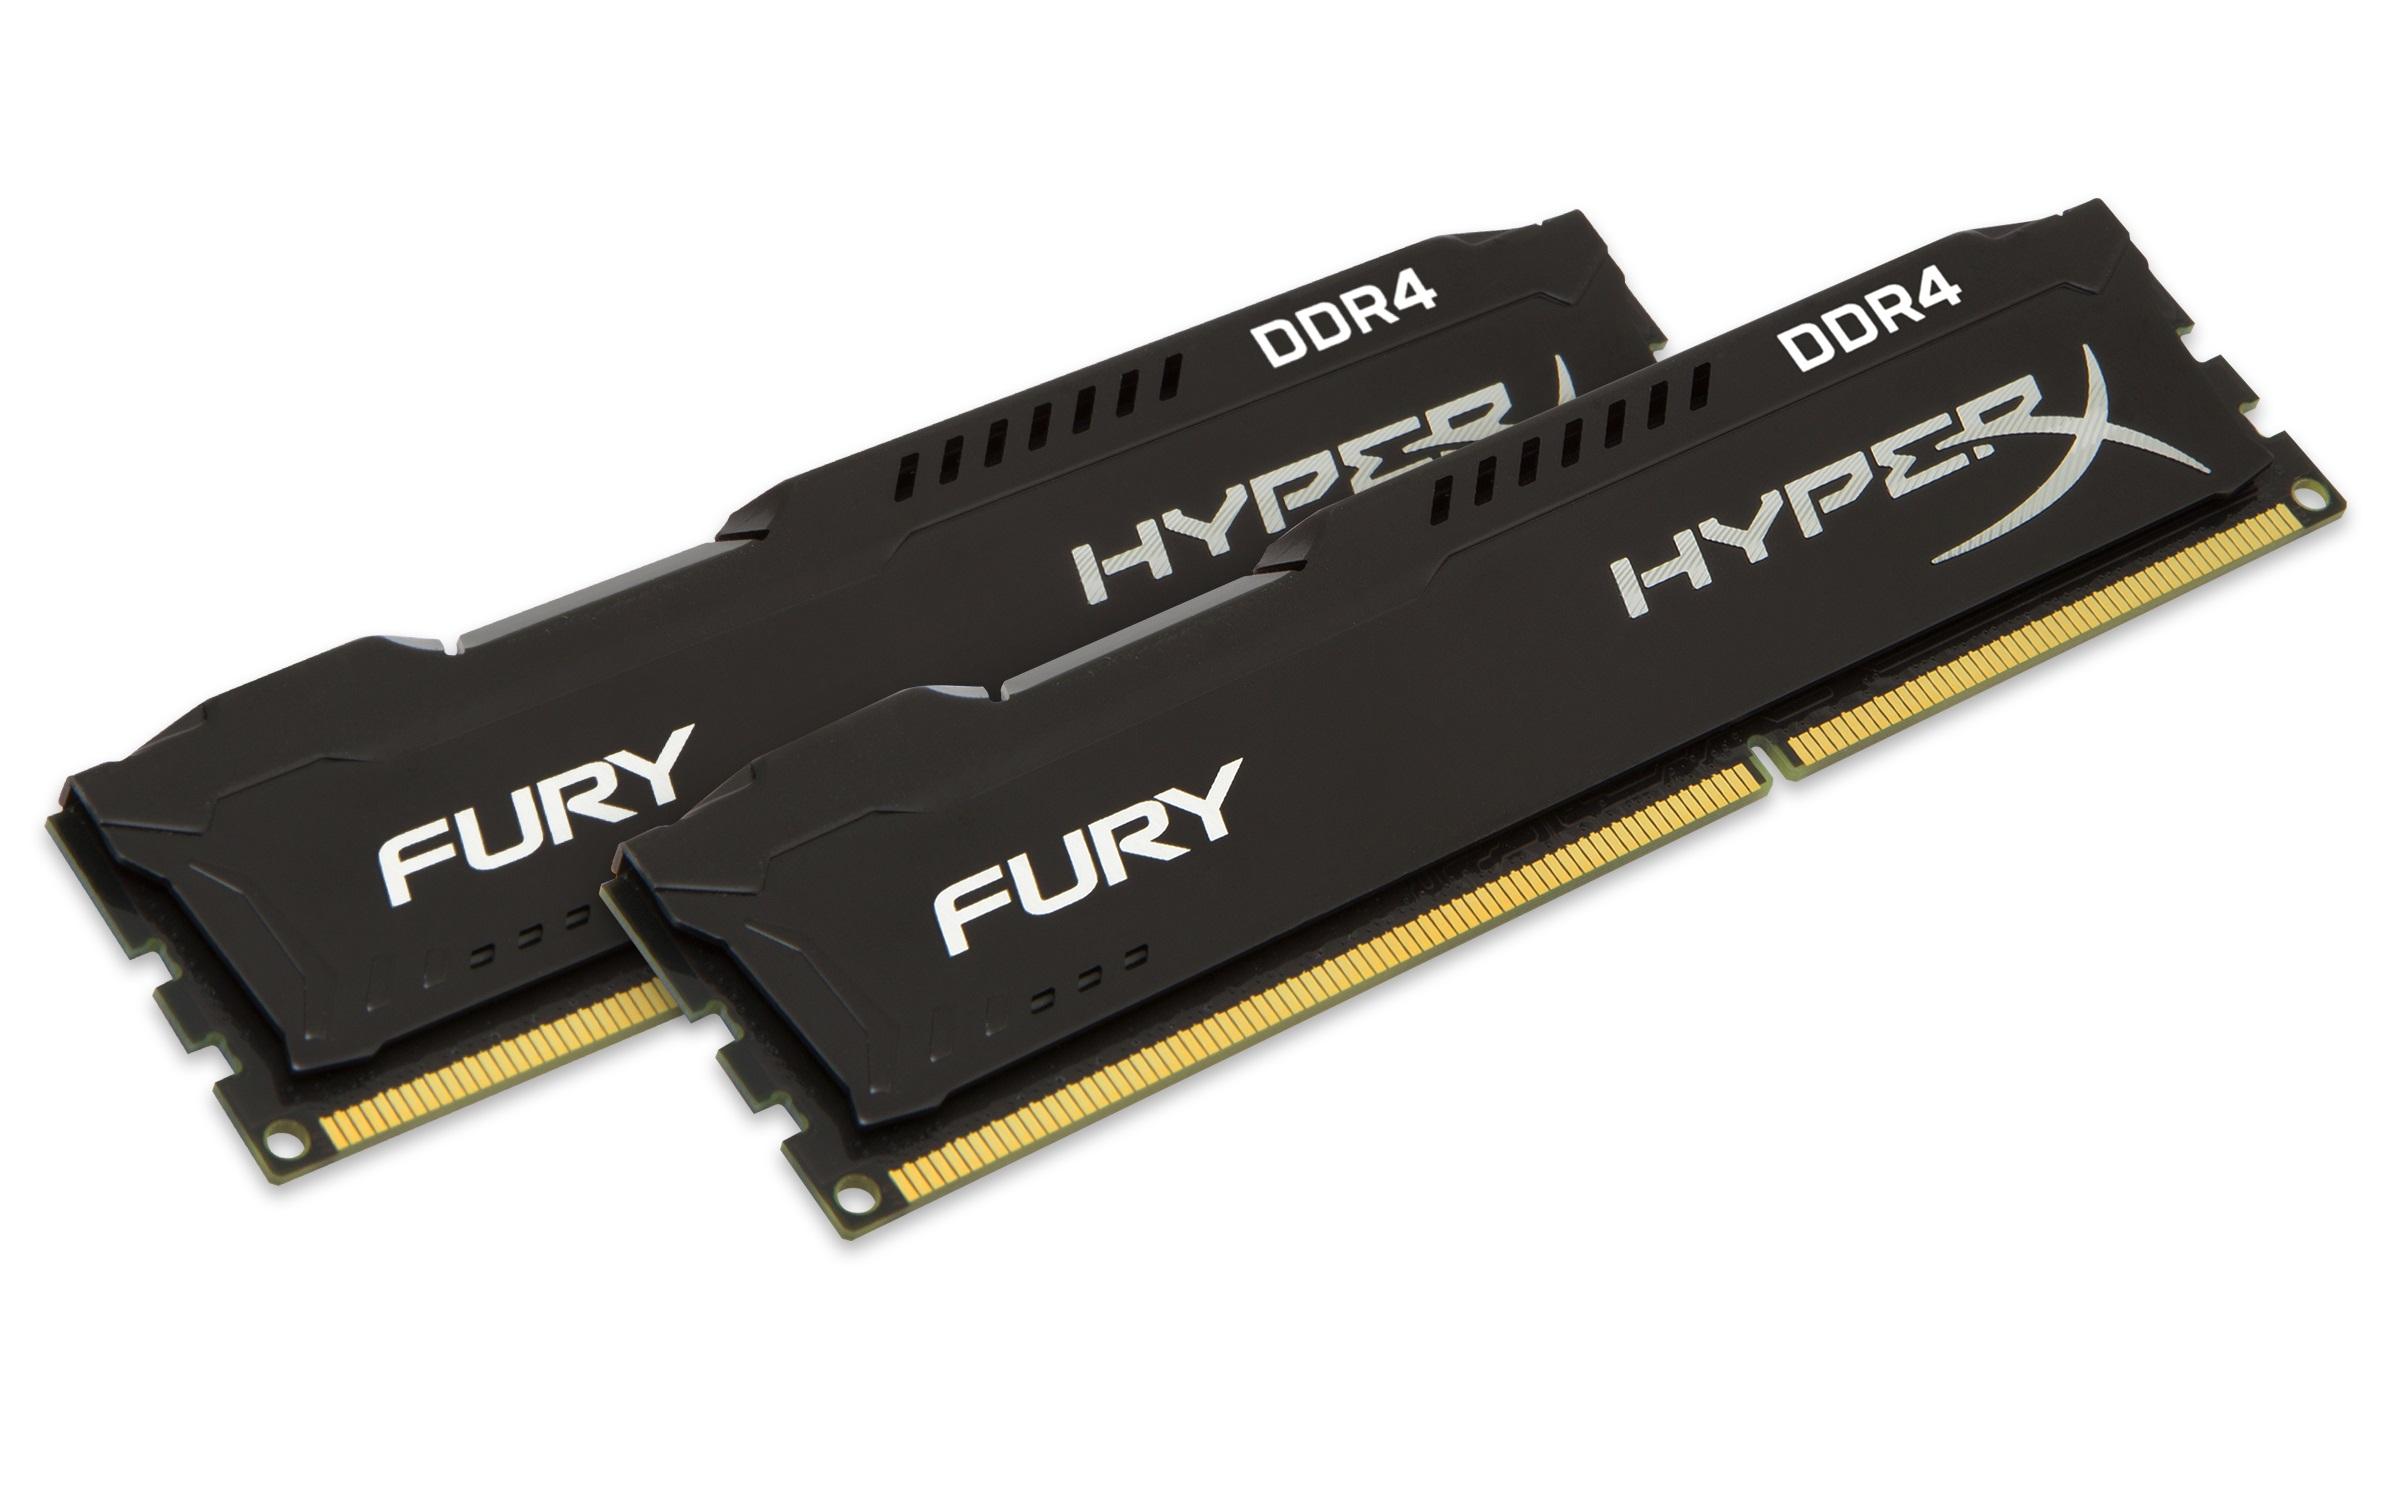 HyperX FURY Memory Black 16GB Kit (2x8GB) DDR4 2400MHz CL15 DIMM 16GB DDR4 2400MHz memory module